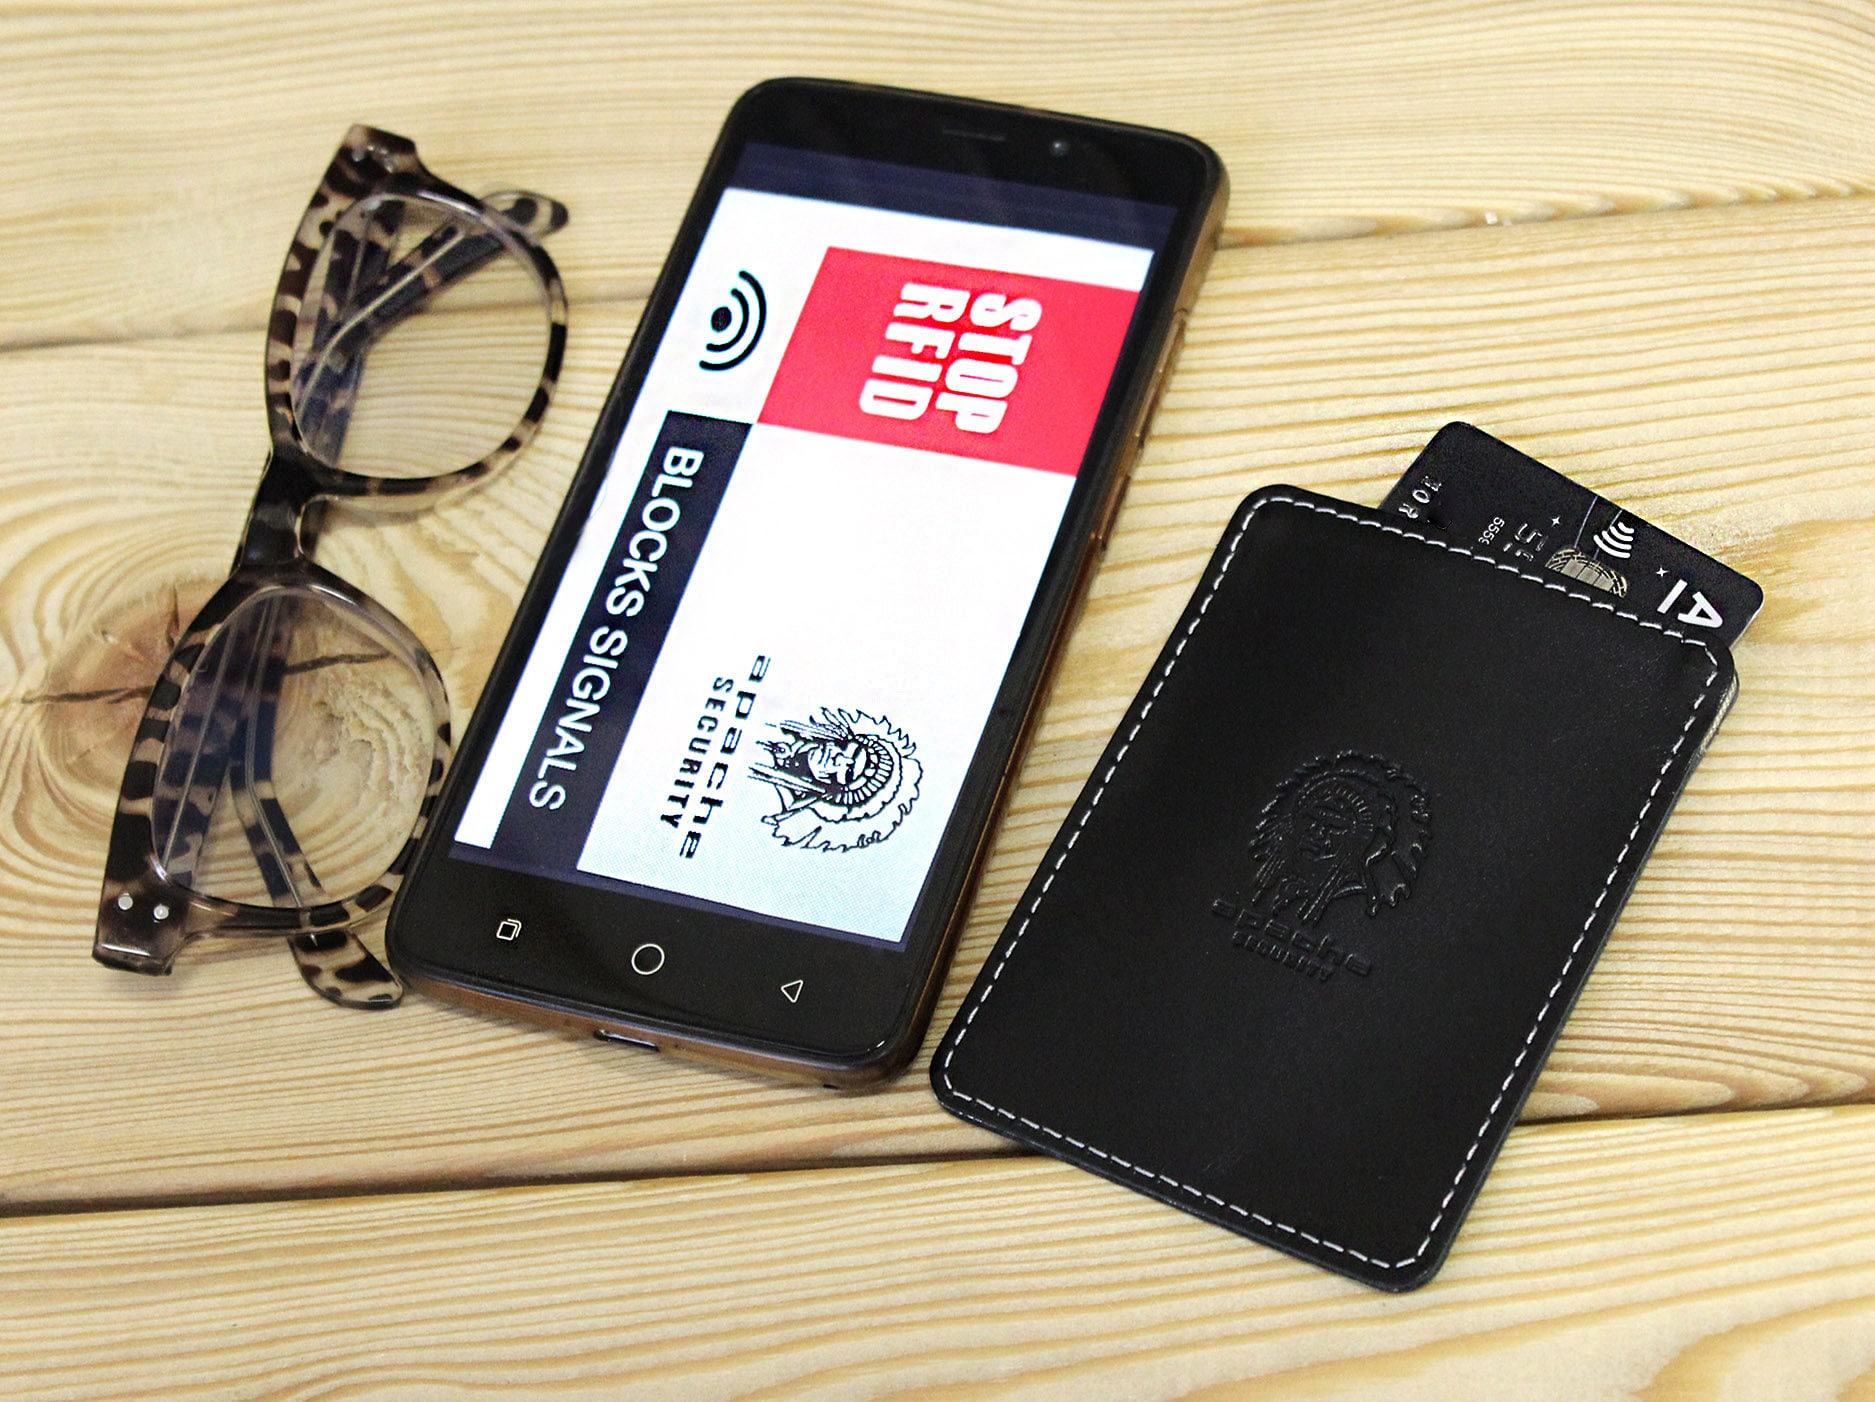 STOP RFID card sleeve, Stop Rfid card holder, Rfid blocking card sleeve,  Anti-theft card holder, Leather RFID-blocking card sleeve,for cards